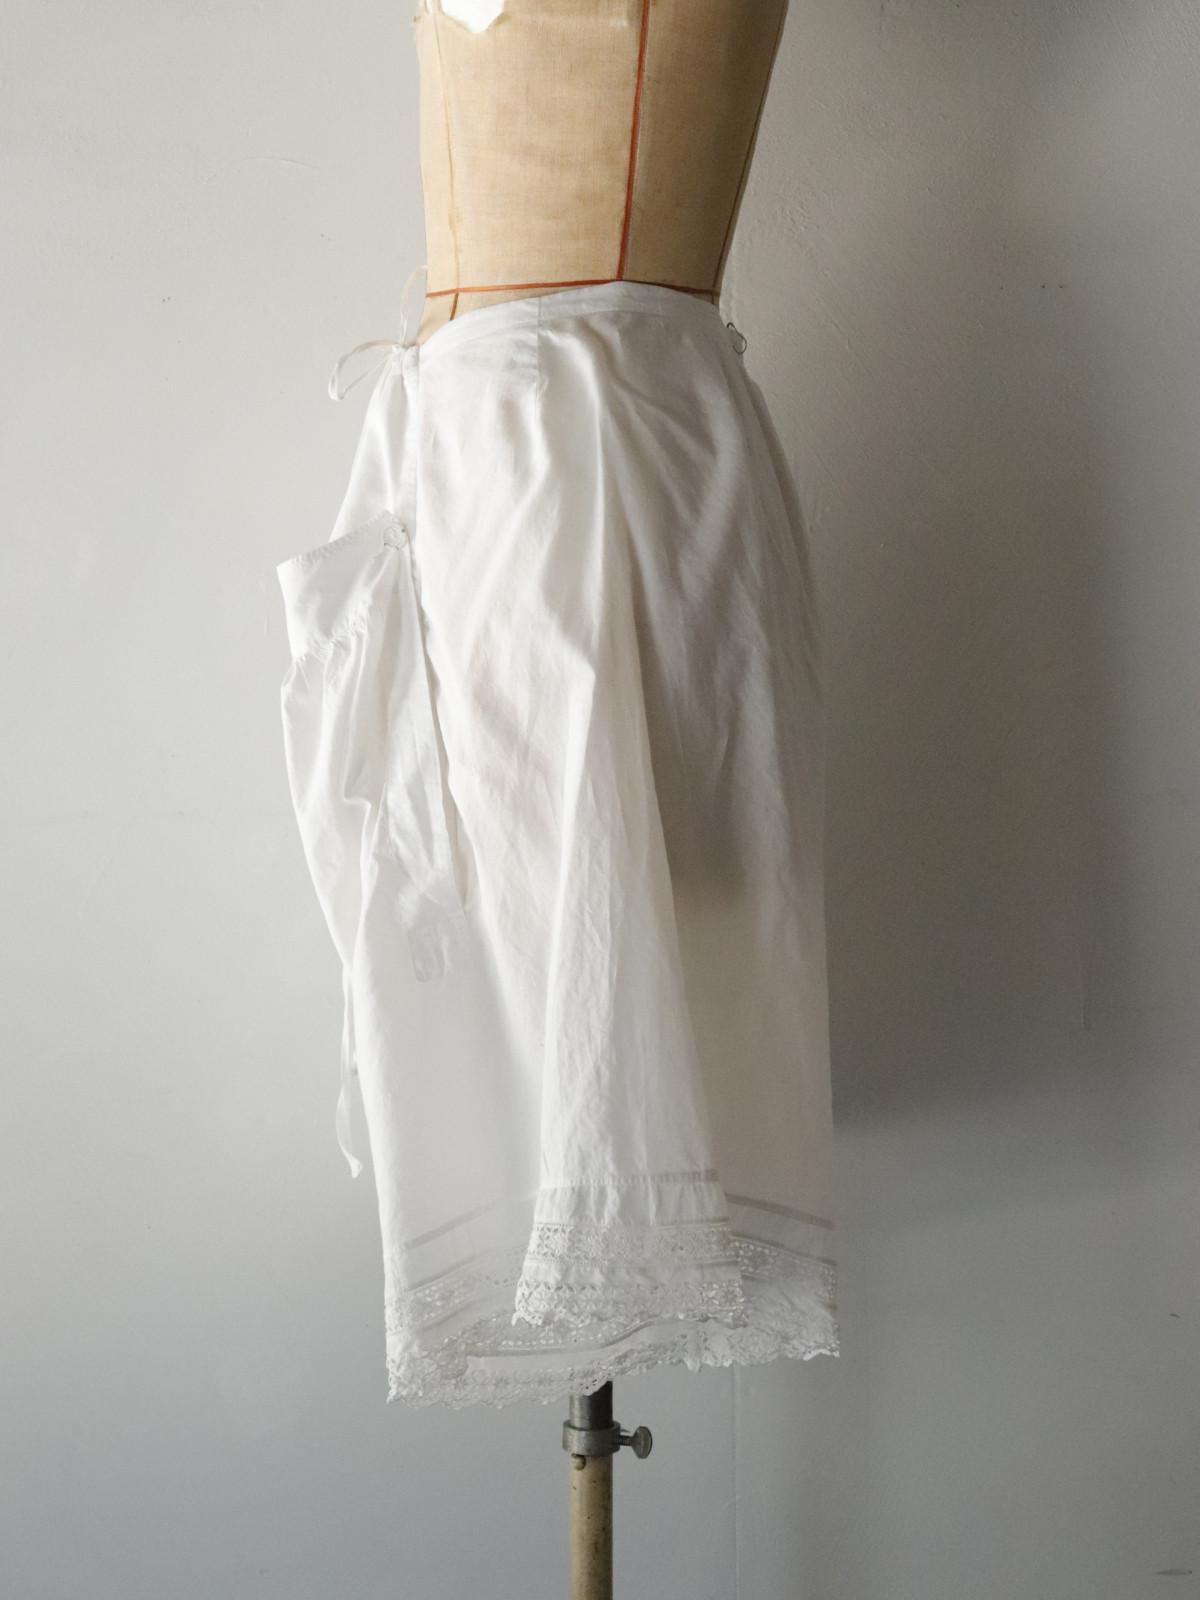 vintage,europe,linen,cotton,nightwear,lace,enbroidery,pants